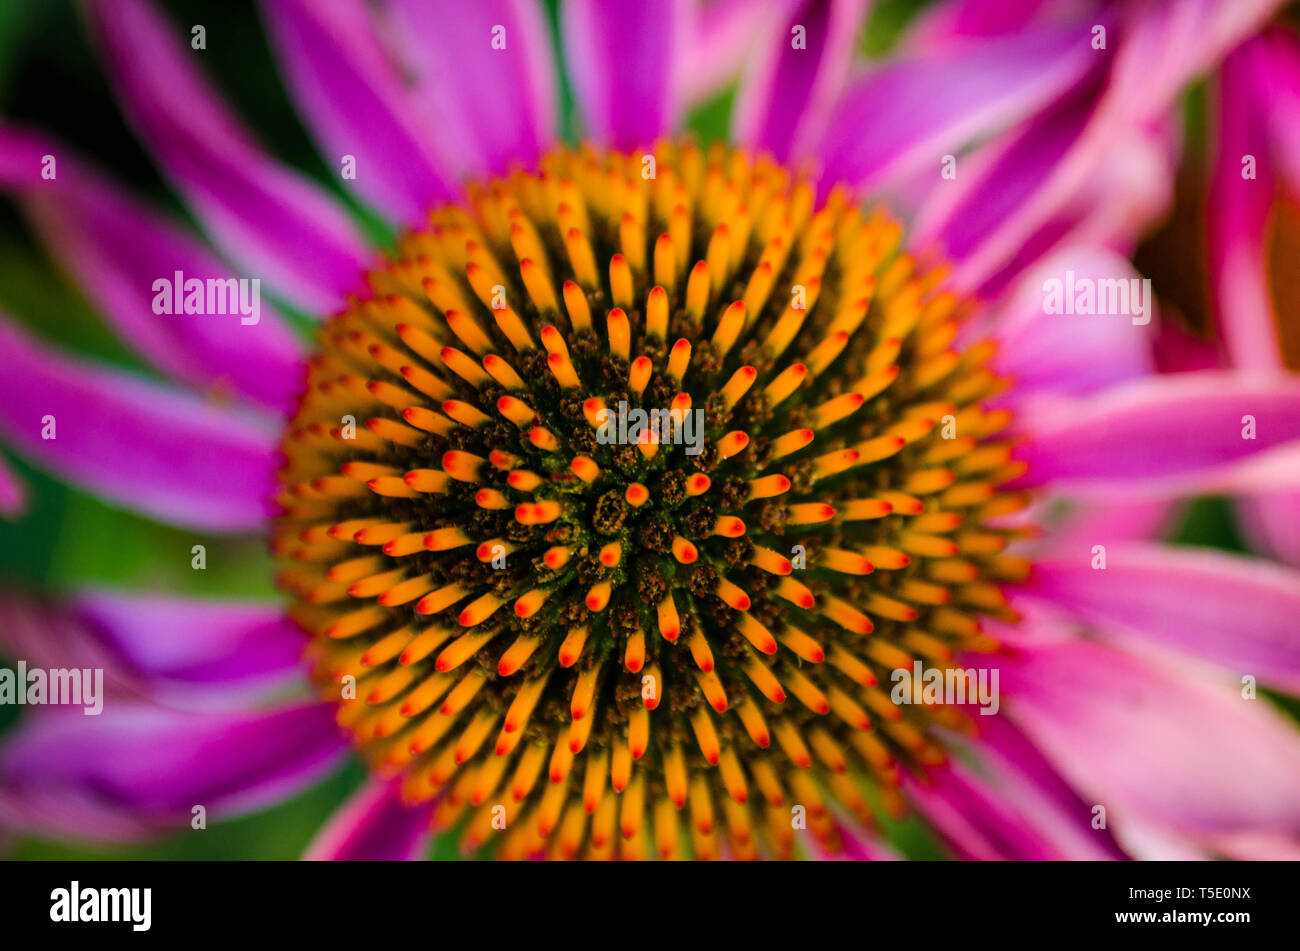 Blume, Sonnenhut, Echinacea, Lila Echinacea, Roter Sonnenhut, Purpur Sonnenhut, Echinacea Purpurea. Nahaufnahme der Blüte - Stock Image